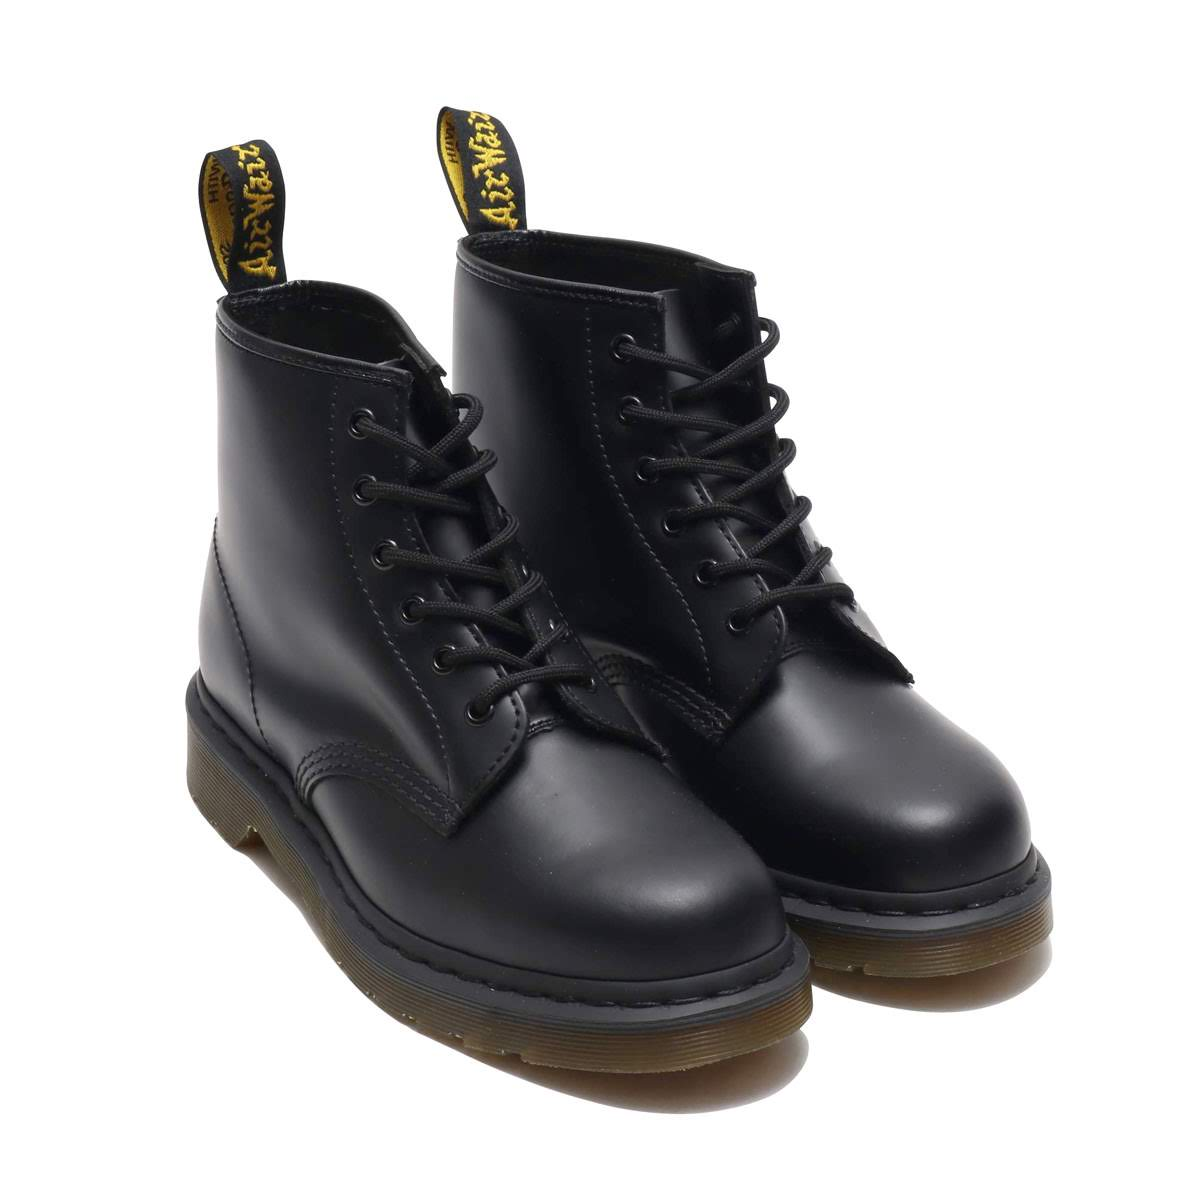 Dr.Martens 101 6EYE BOOT(ドクターマーチン 101 6アイ ブーツ)BLACK【メンズ レディース】16FW-I